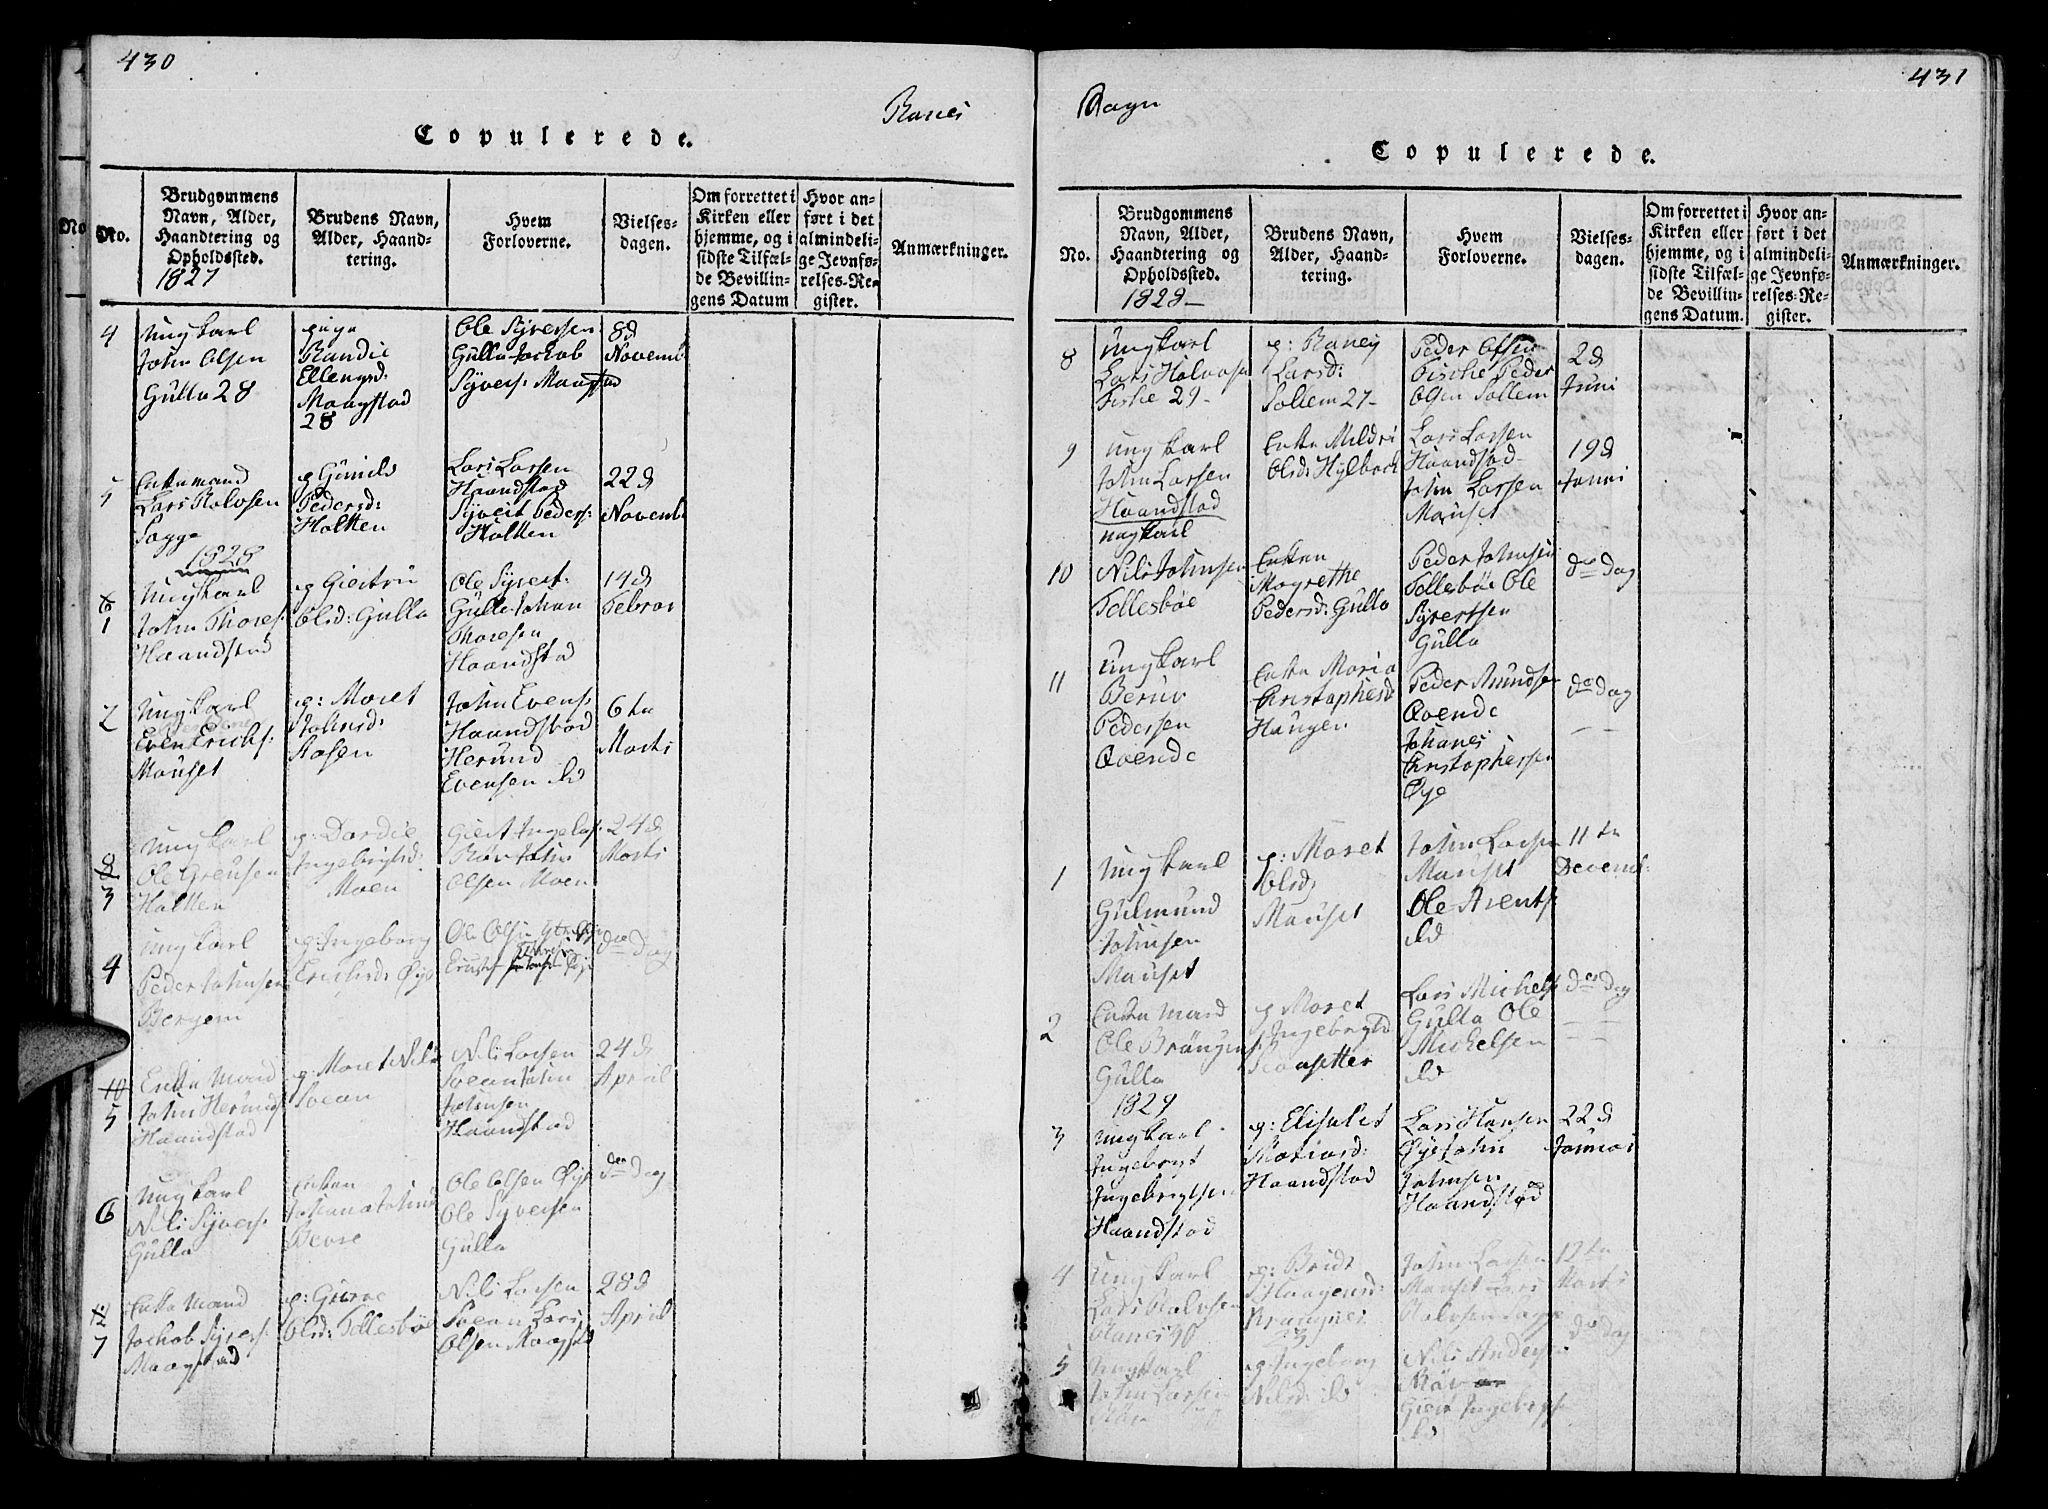 folketellingen 1801 alstahaug